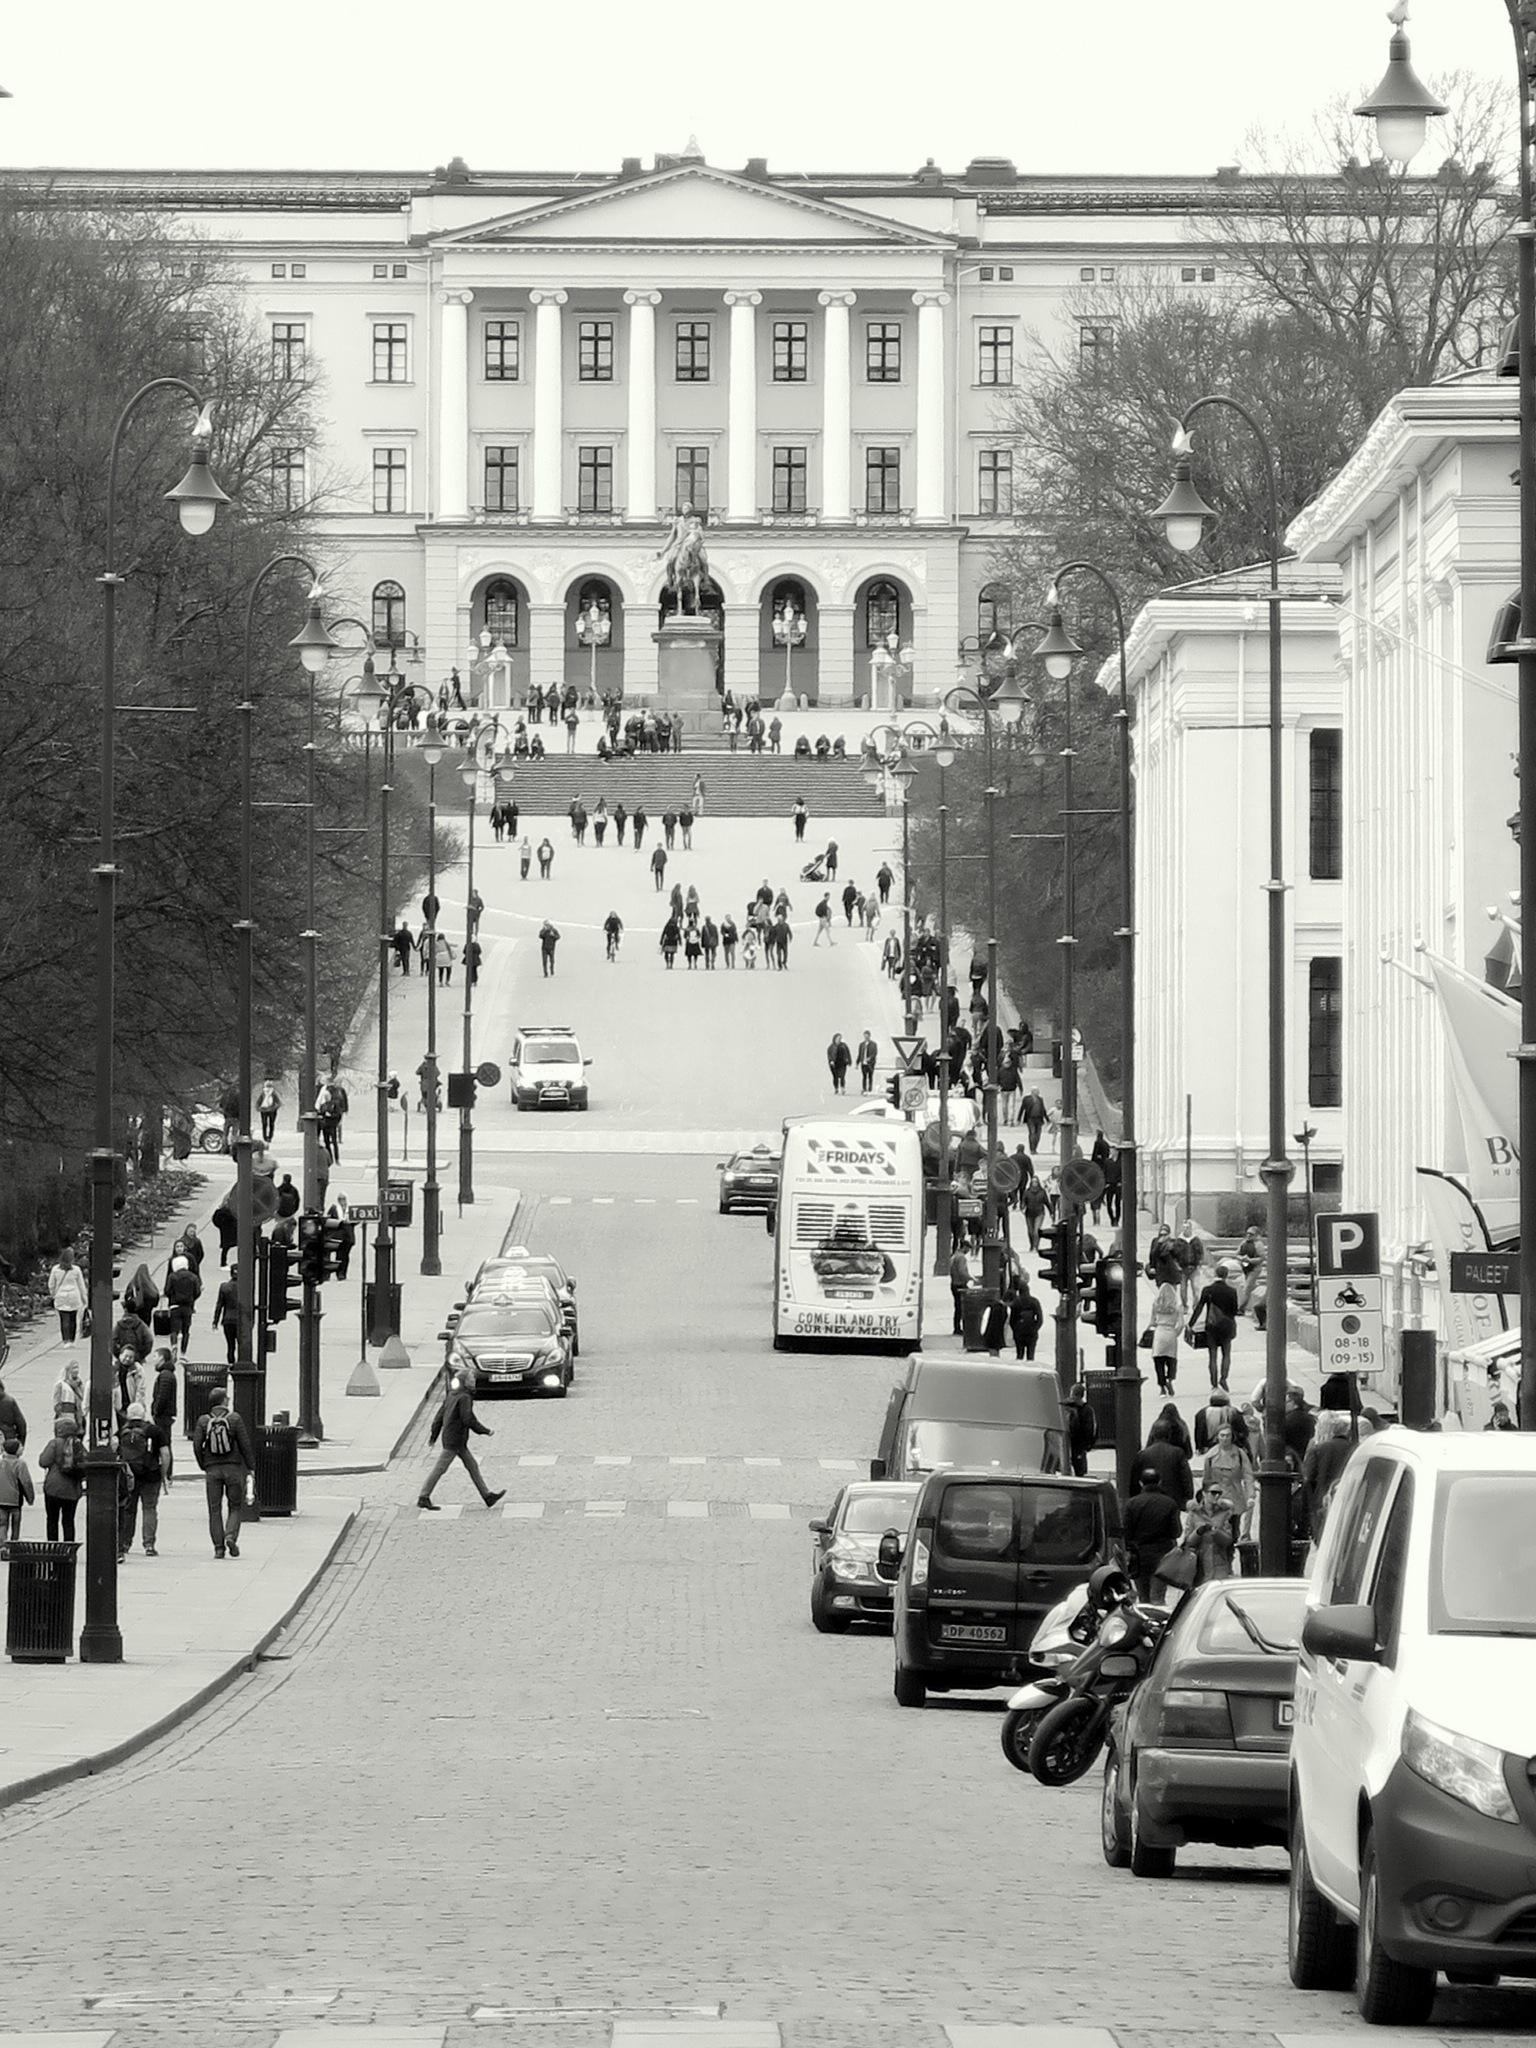 Oslo by Abdelmuhaymin